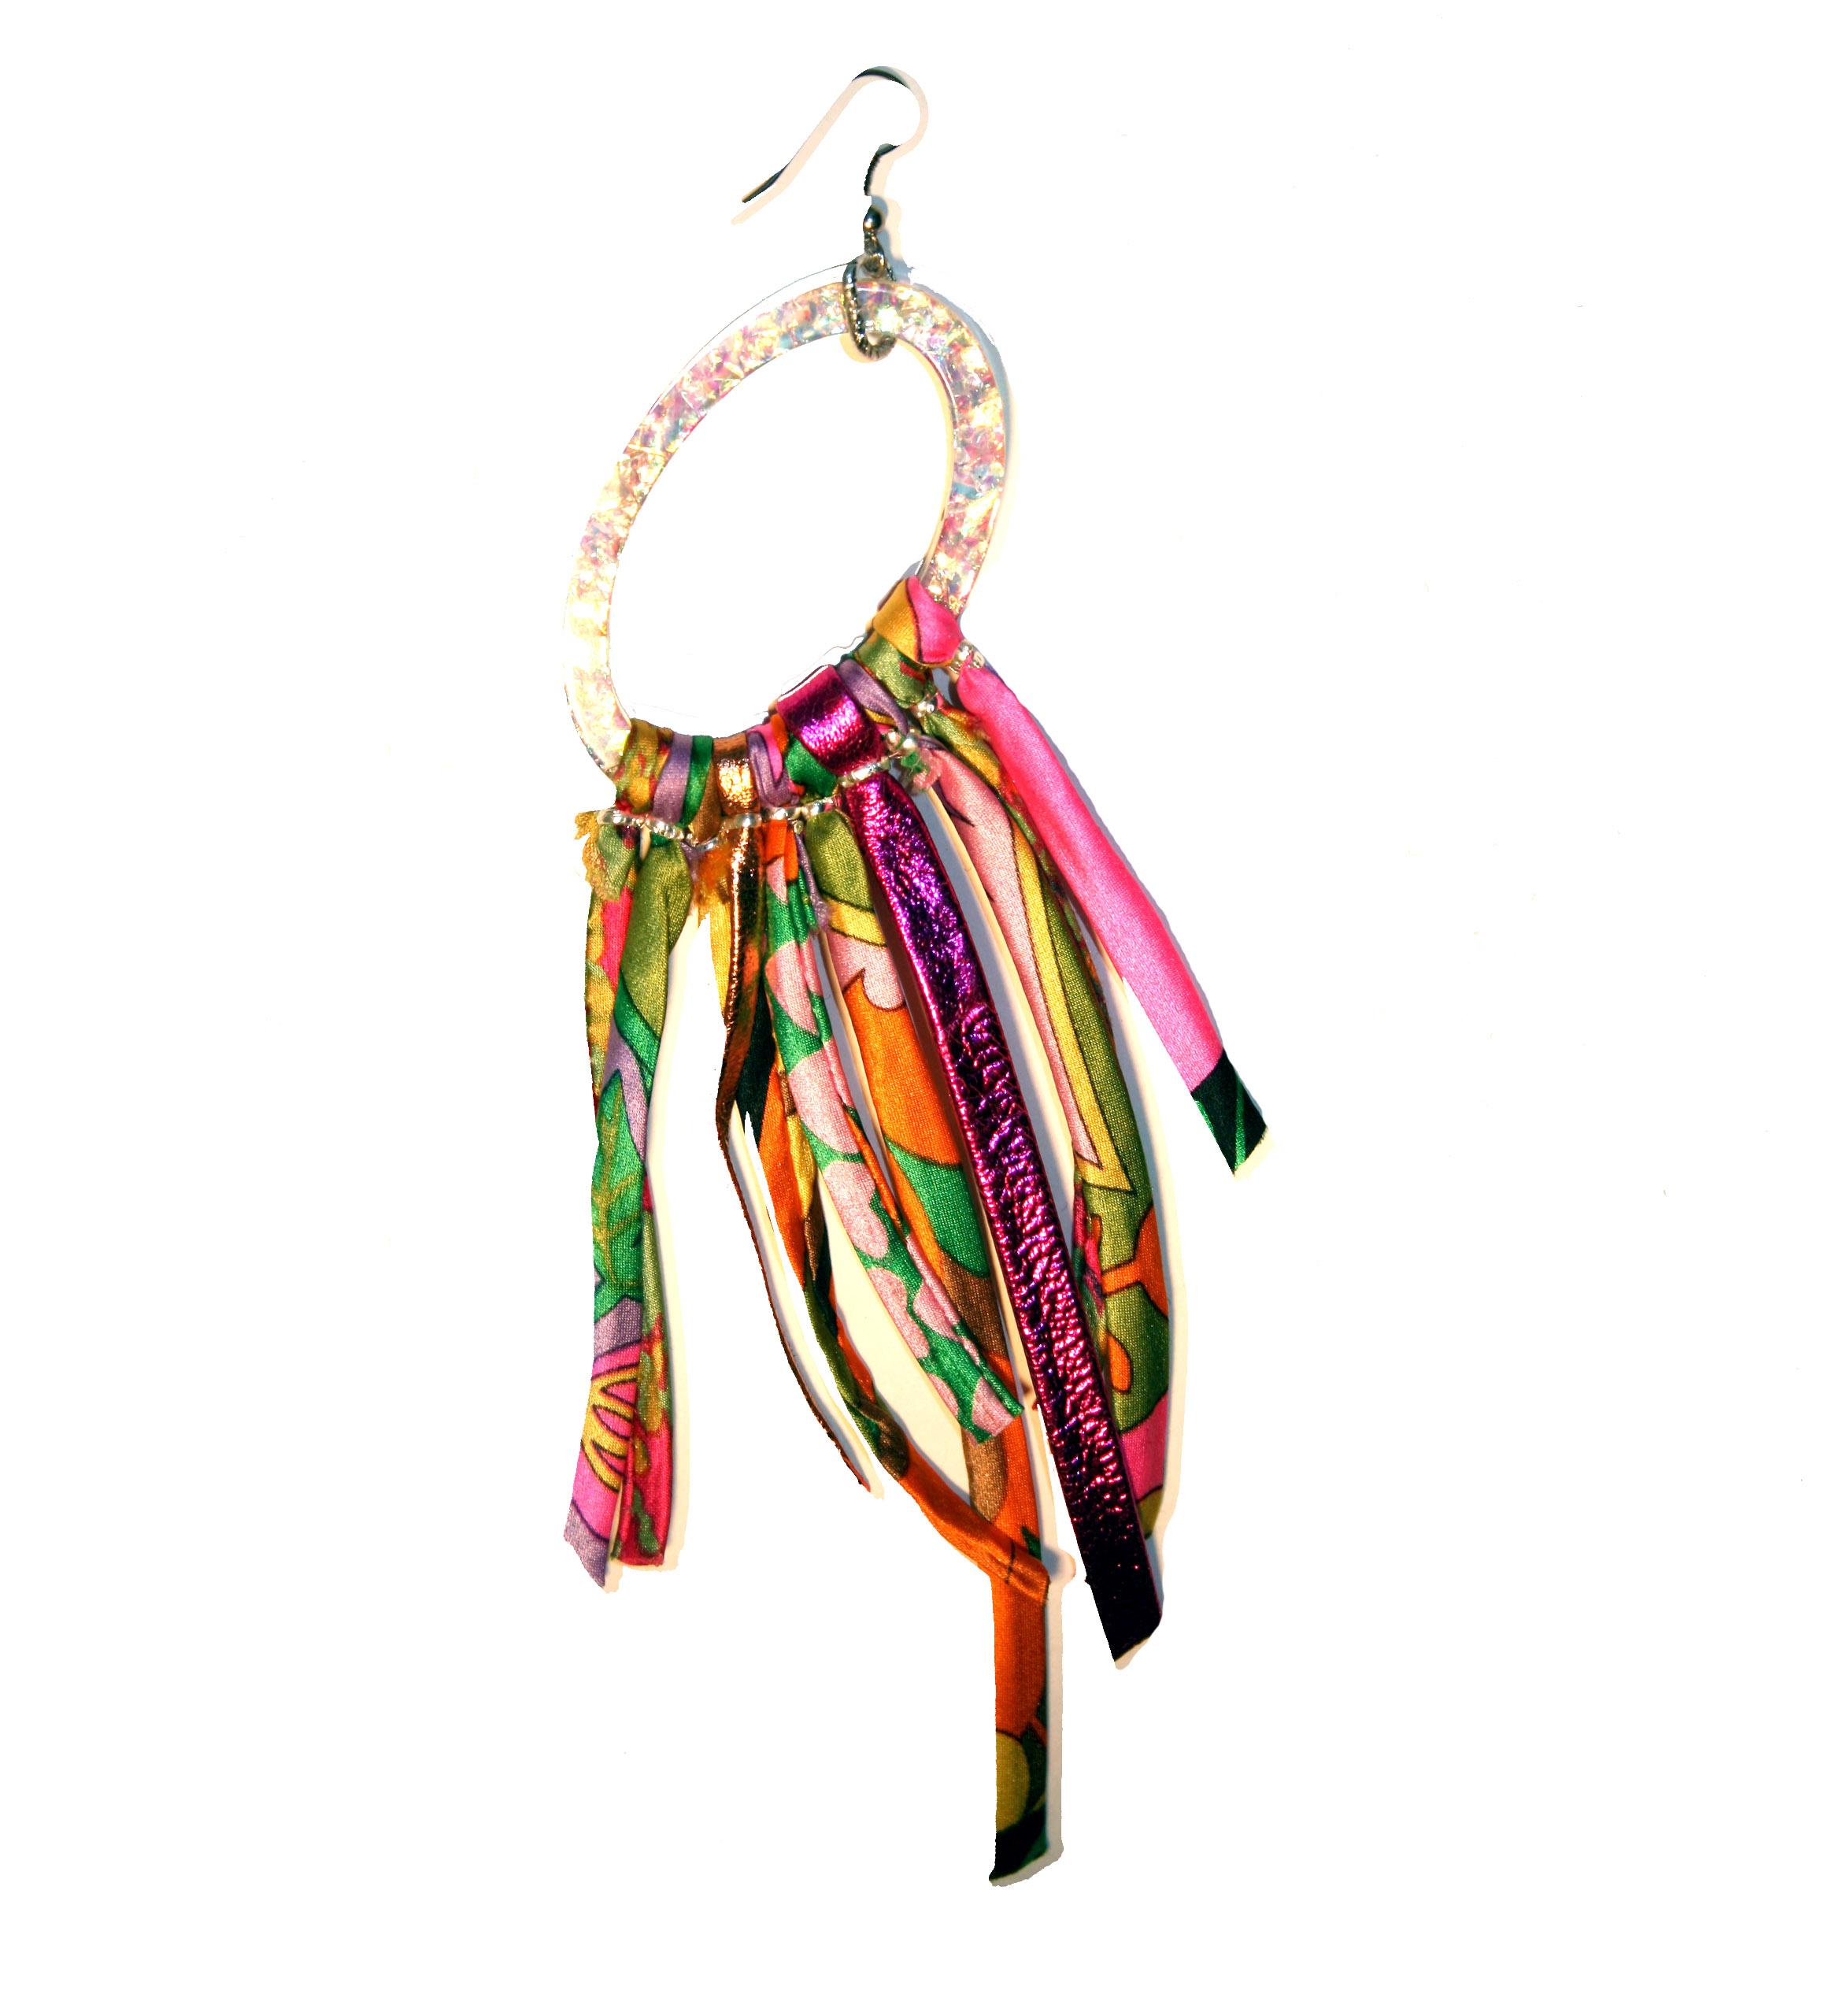 Abeni Earring